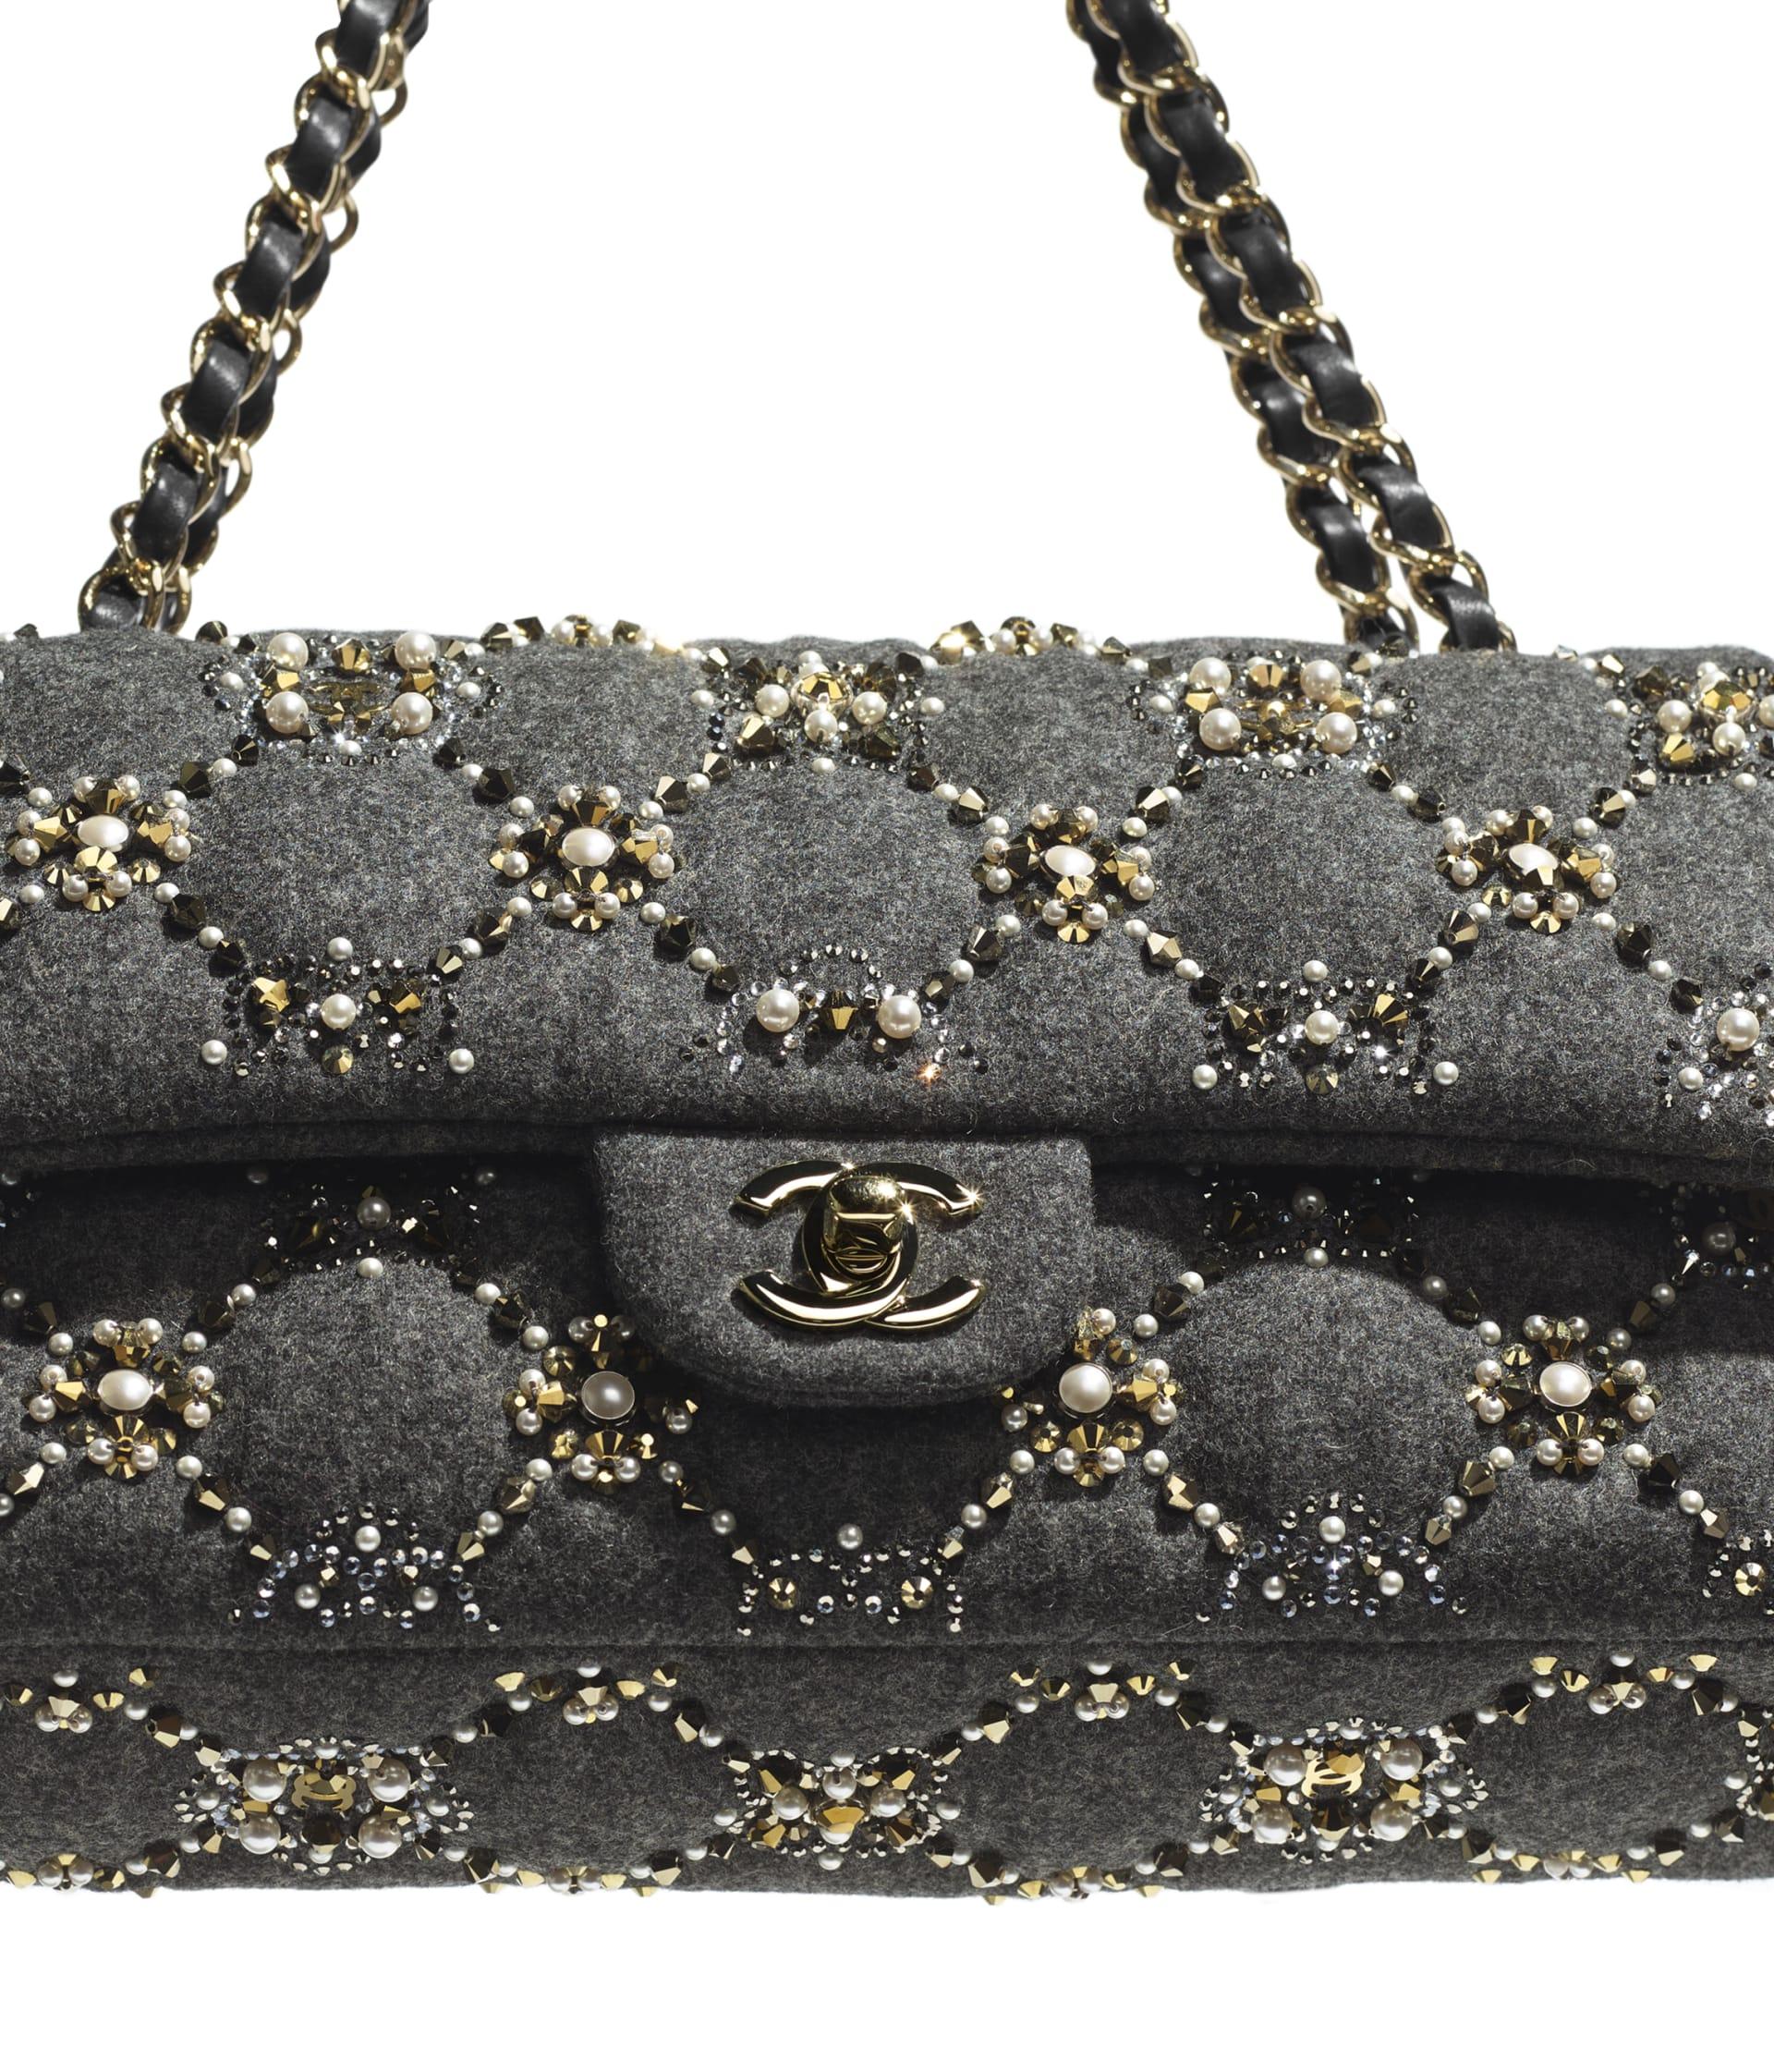 image 4 - Classic Handbag - Wool, Glass Pearls, Crystal Pearls & Gold-Tone Metal - Gray